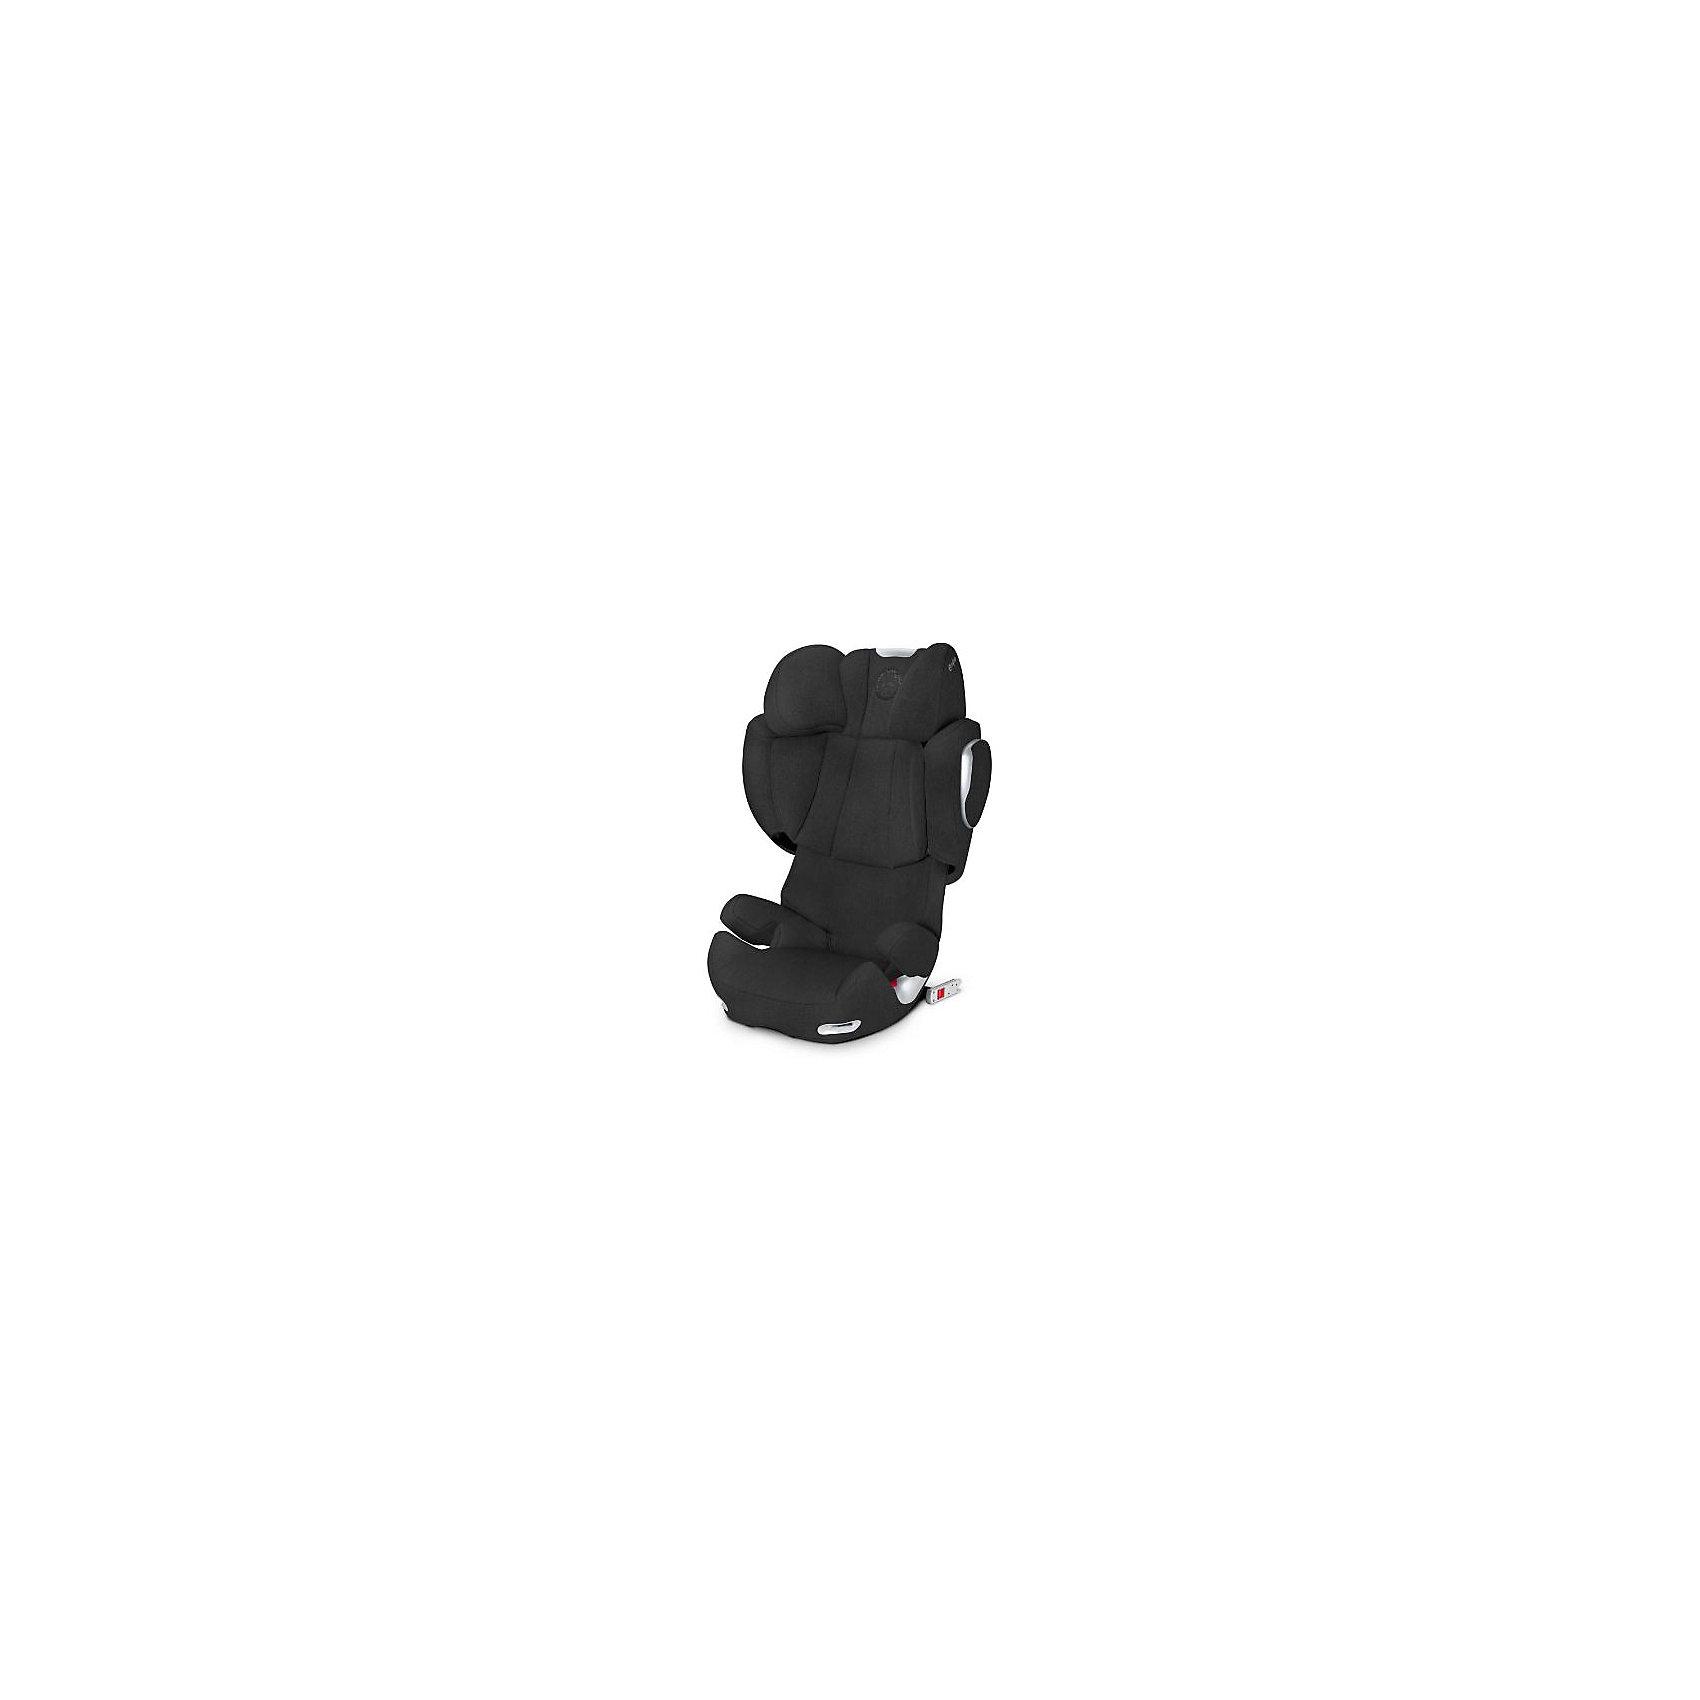 Автокресло Cybex Solution Q2-fix Plus, 15-36 кг, Happy BlackГруппа 2-3 (От 15 до 36 кг)<br>Автокресло детское Solution Q2-fix Plus Happy Black (10216100/210616/0045293/1, КИТАЙ)<br><br>Ширина мм: 650<br>Глубина мм: 490<br>Высота мм: 550<br>Вес г: 8000<br>Возраст от месяцев: 12<br>Возраст до месяцев: 144<br>Пол: Унисекс<br>Возраст: Детский<br>SKU: 5542596